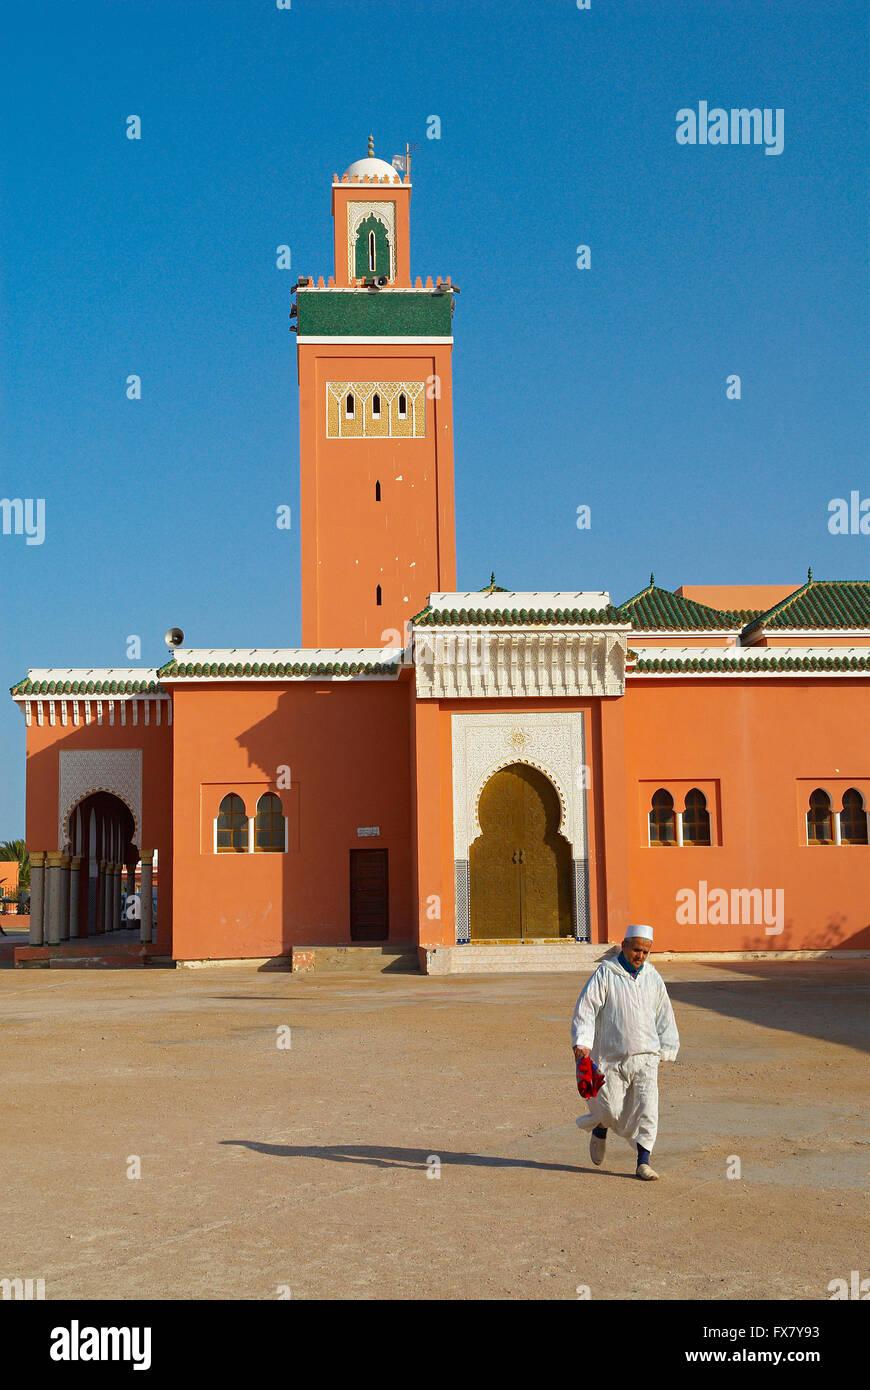 Maroc. Grand Sud. Laayoune. Grande mosquee. Ancien Sahara espagnol. // Morocco. South Morocco. Laayoune. Mosque. - Stock Image